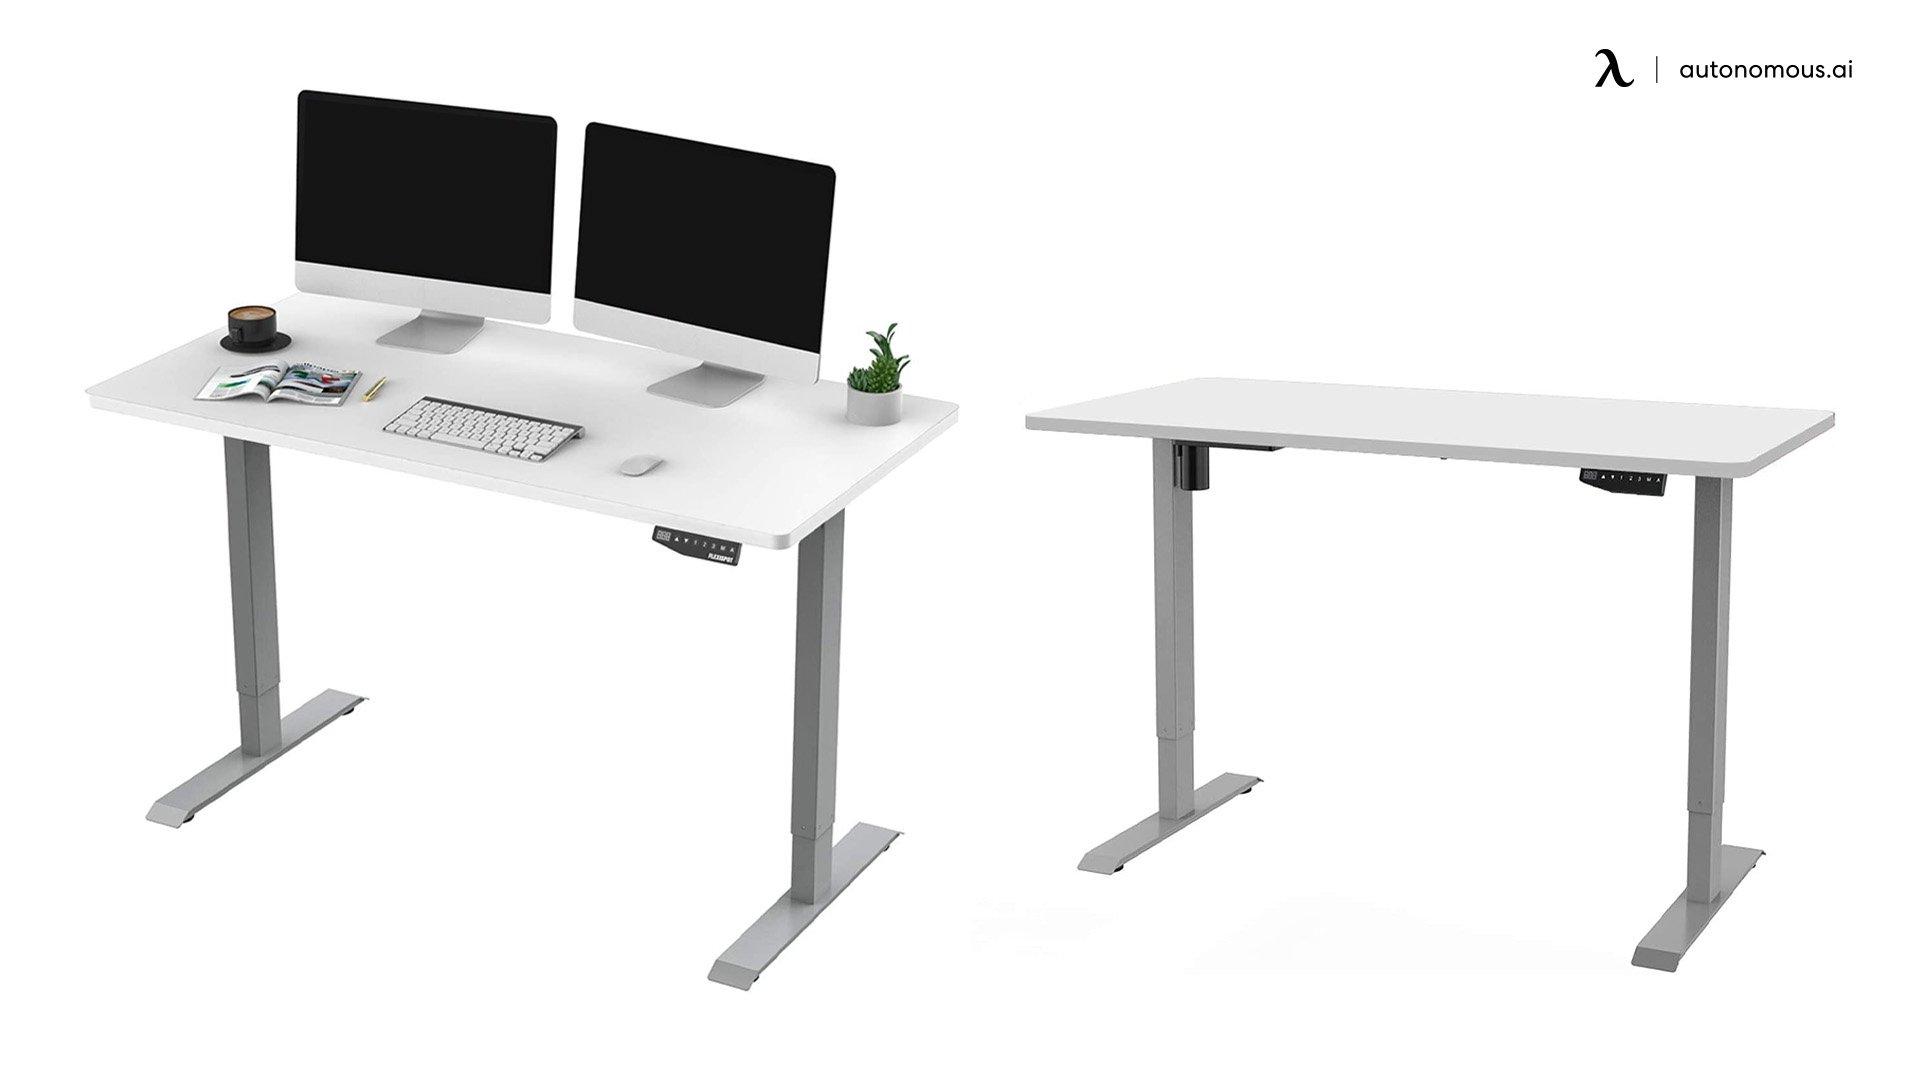 Flexispot's EN1 Electric White Standing Desk